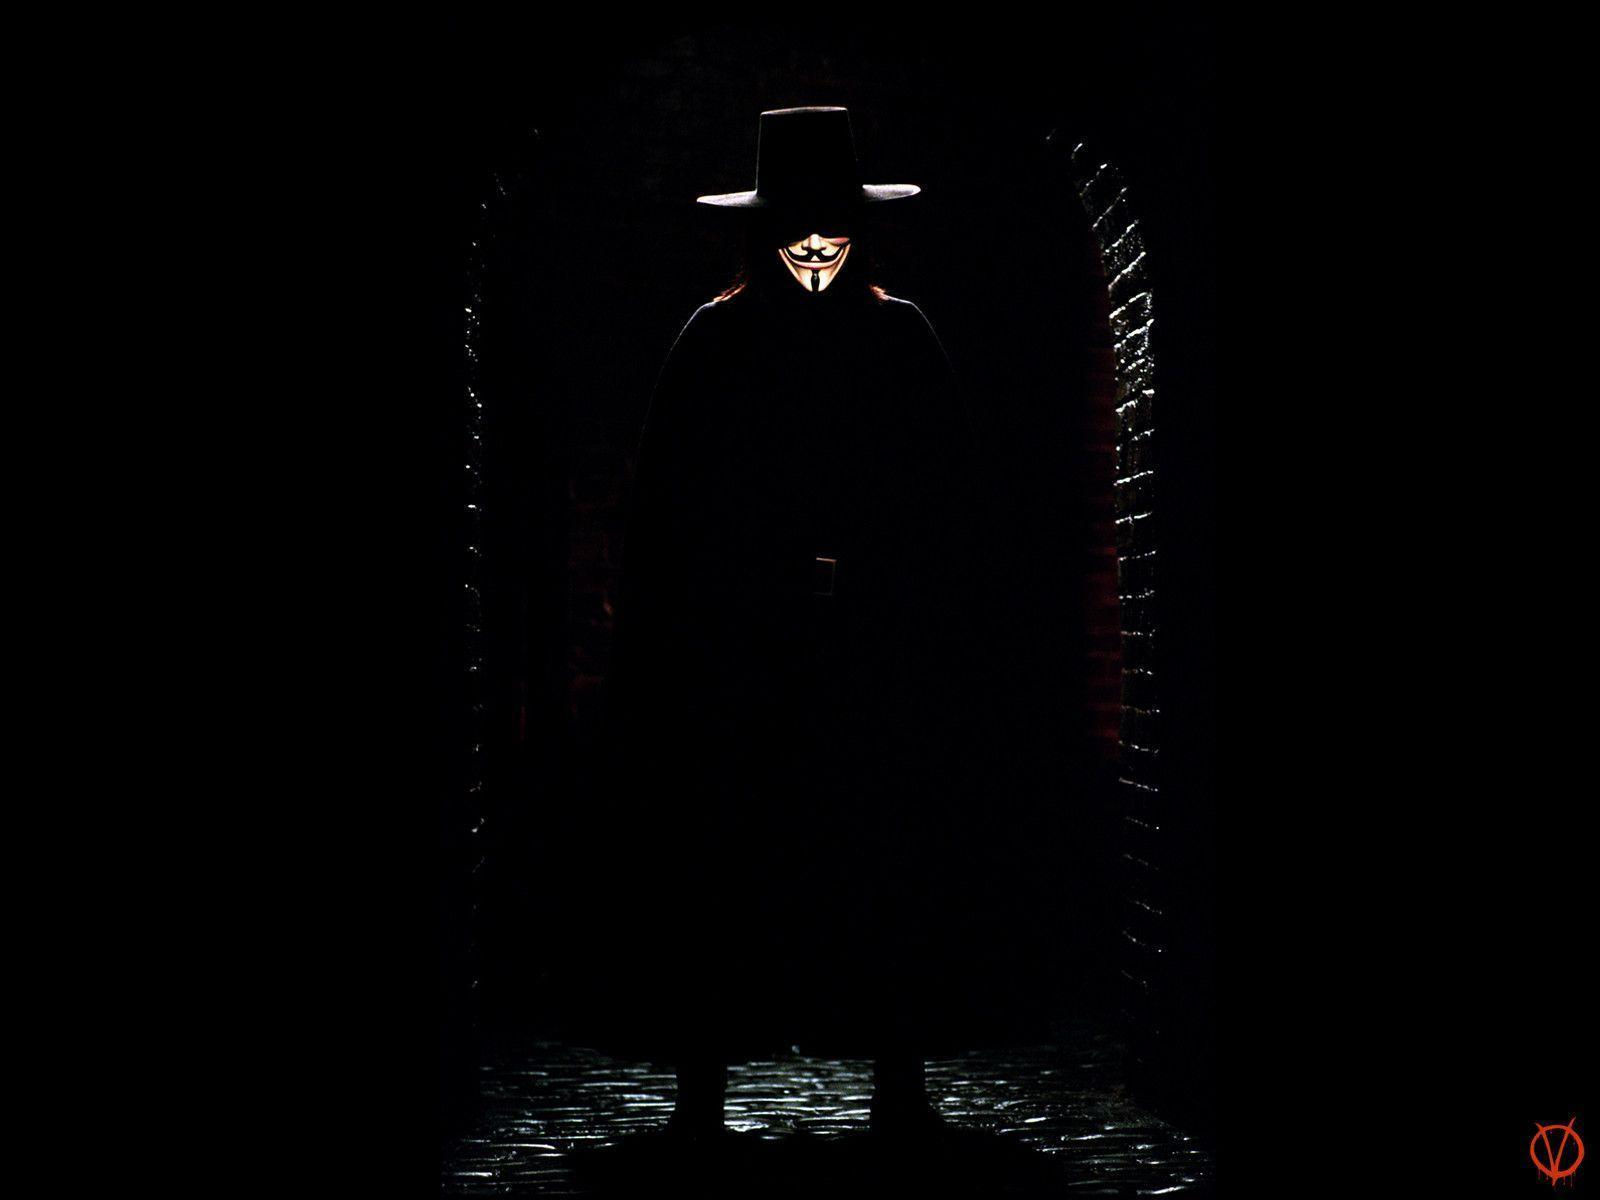 V For Vendetta TheWallpapers